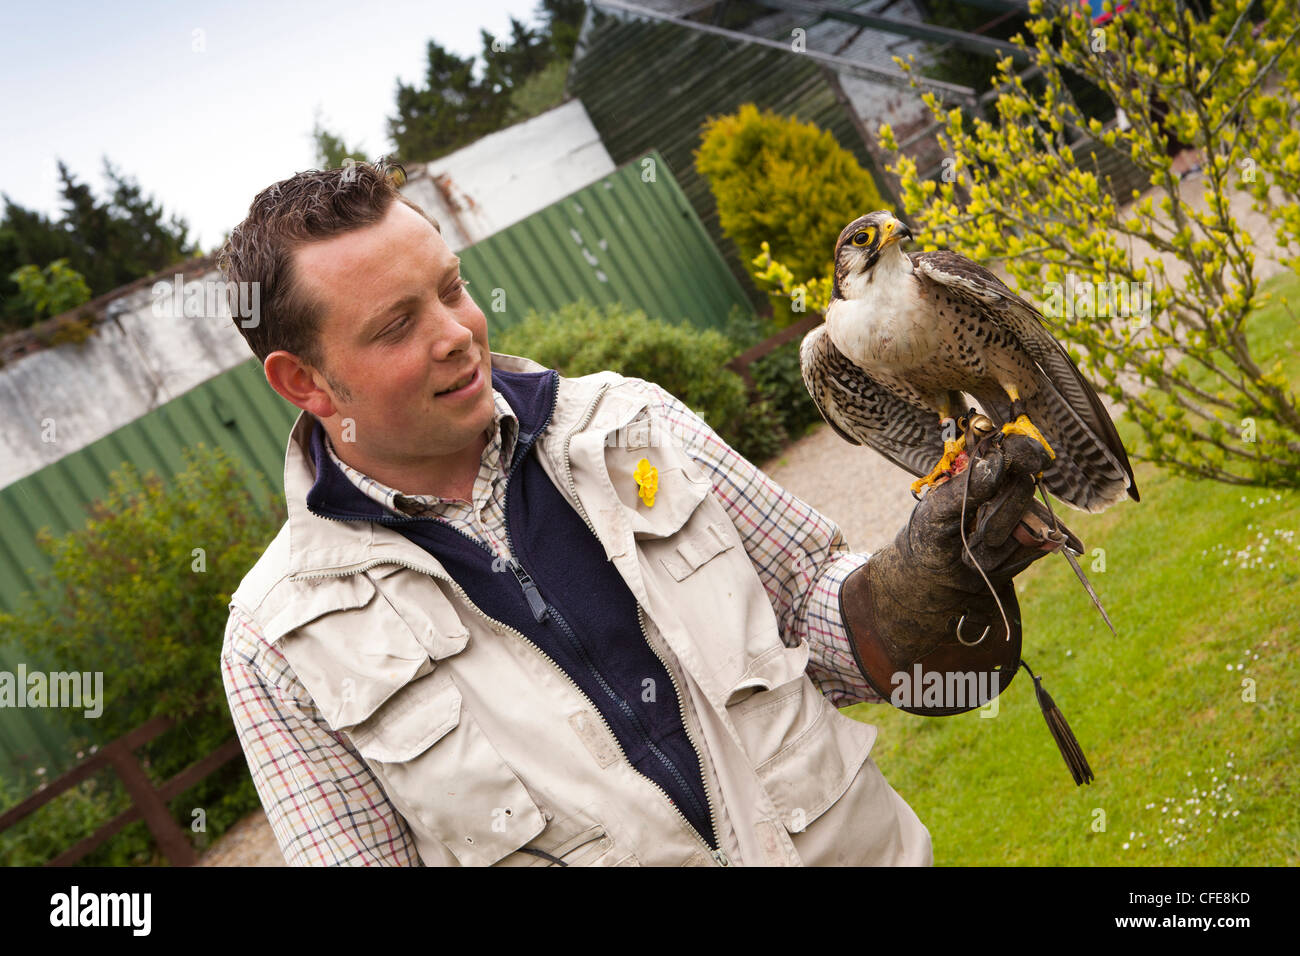 UK, England, Yorkshire, Bedale, Thorpe Perrow Arboretum, Falconry handler with Harris Hawk - Stock Image